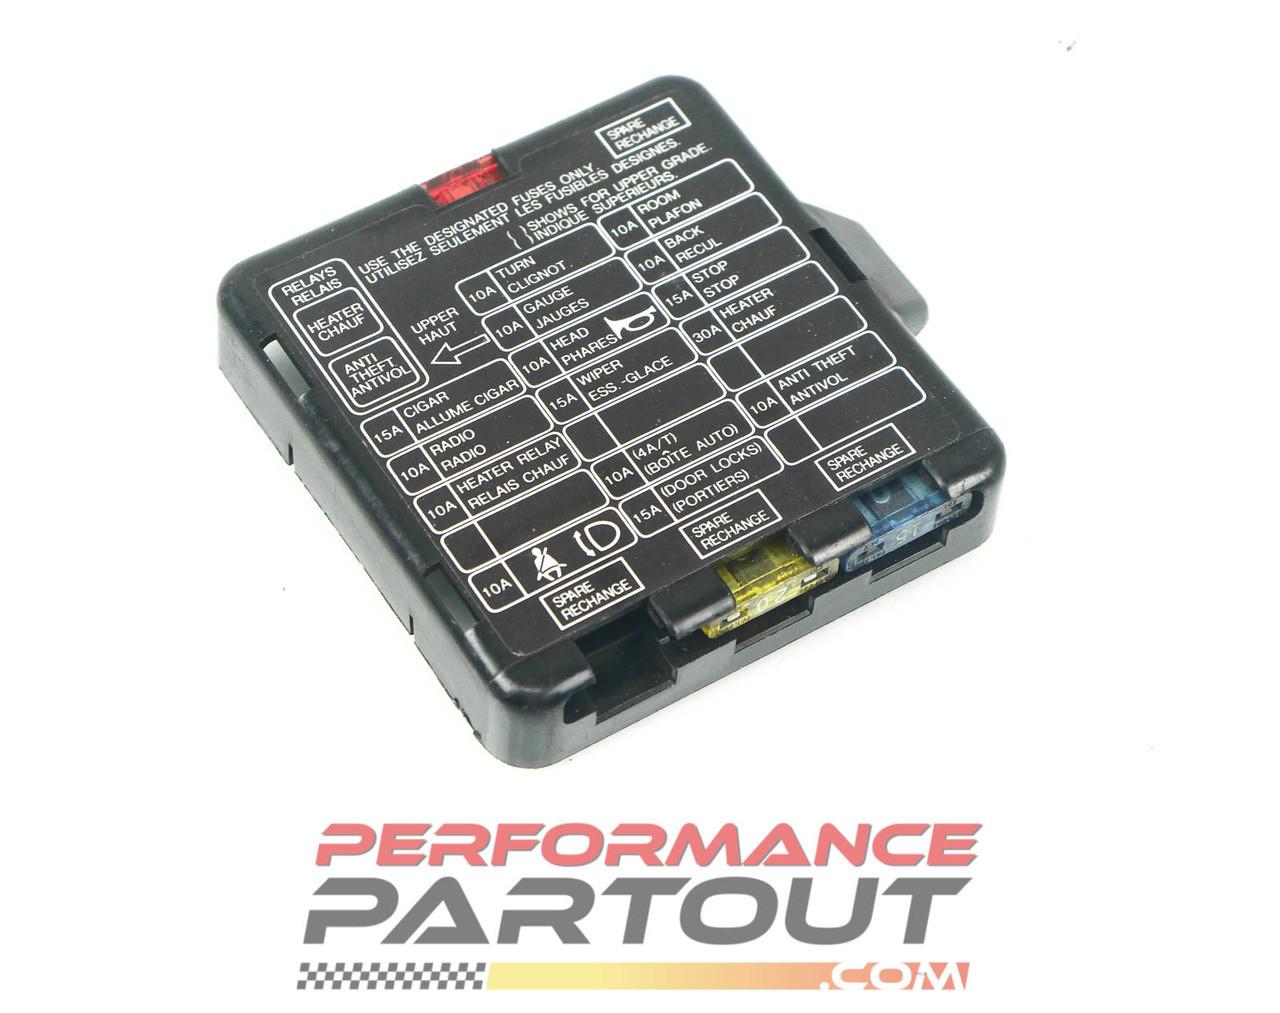 fuse box cover interior 90 94 dsm performance partout  fuse box cover interior 90 94 dsm